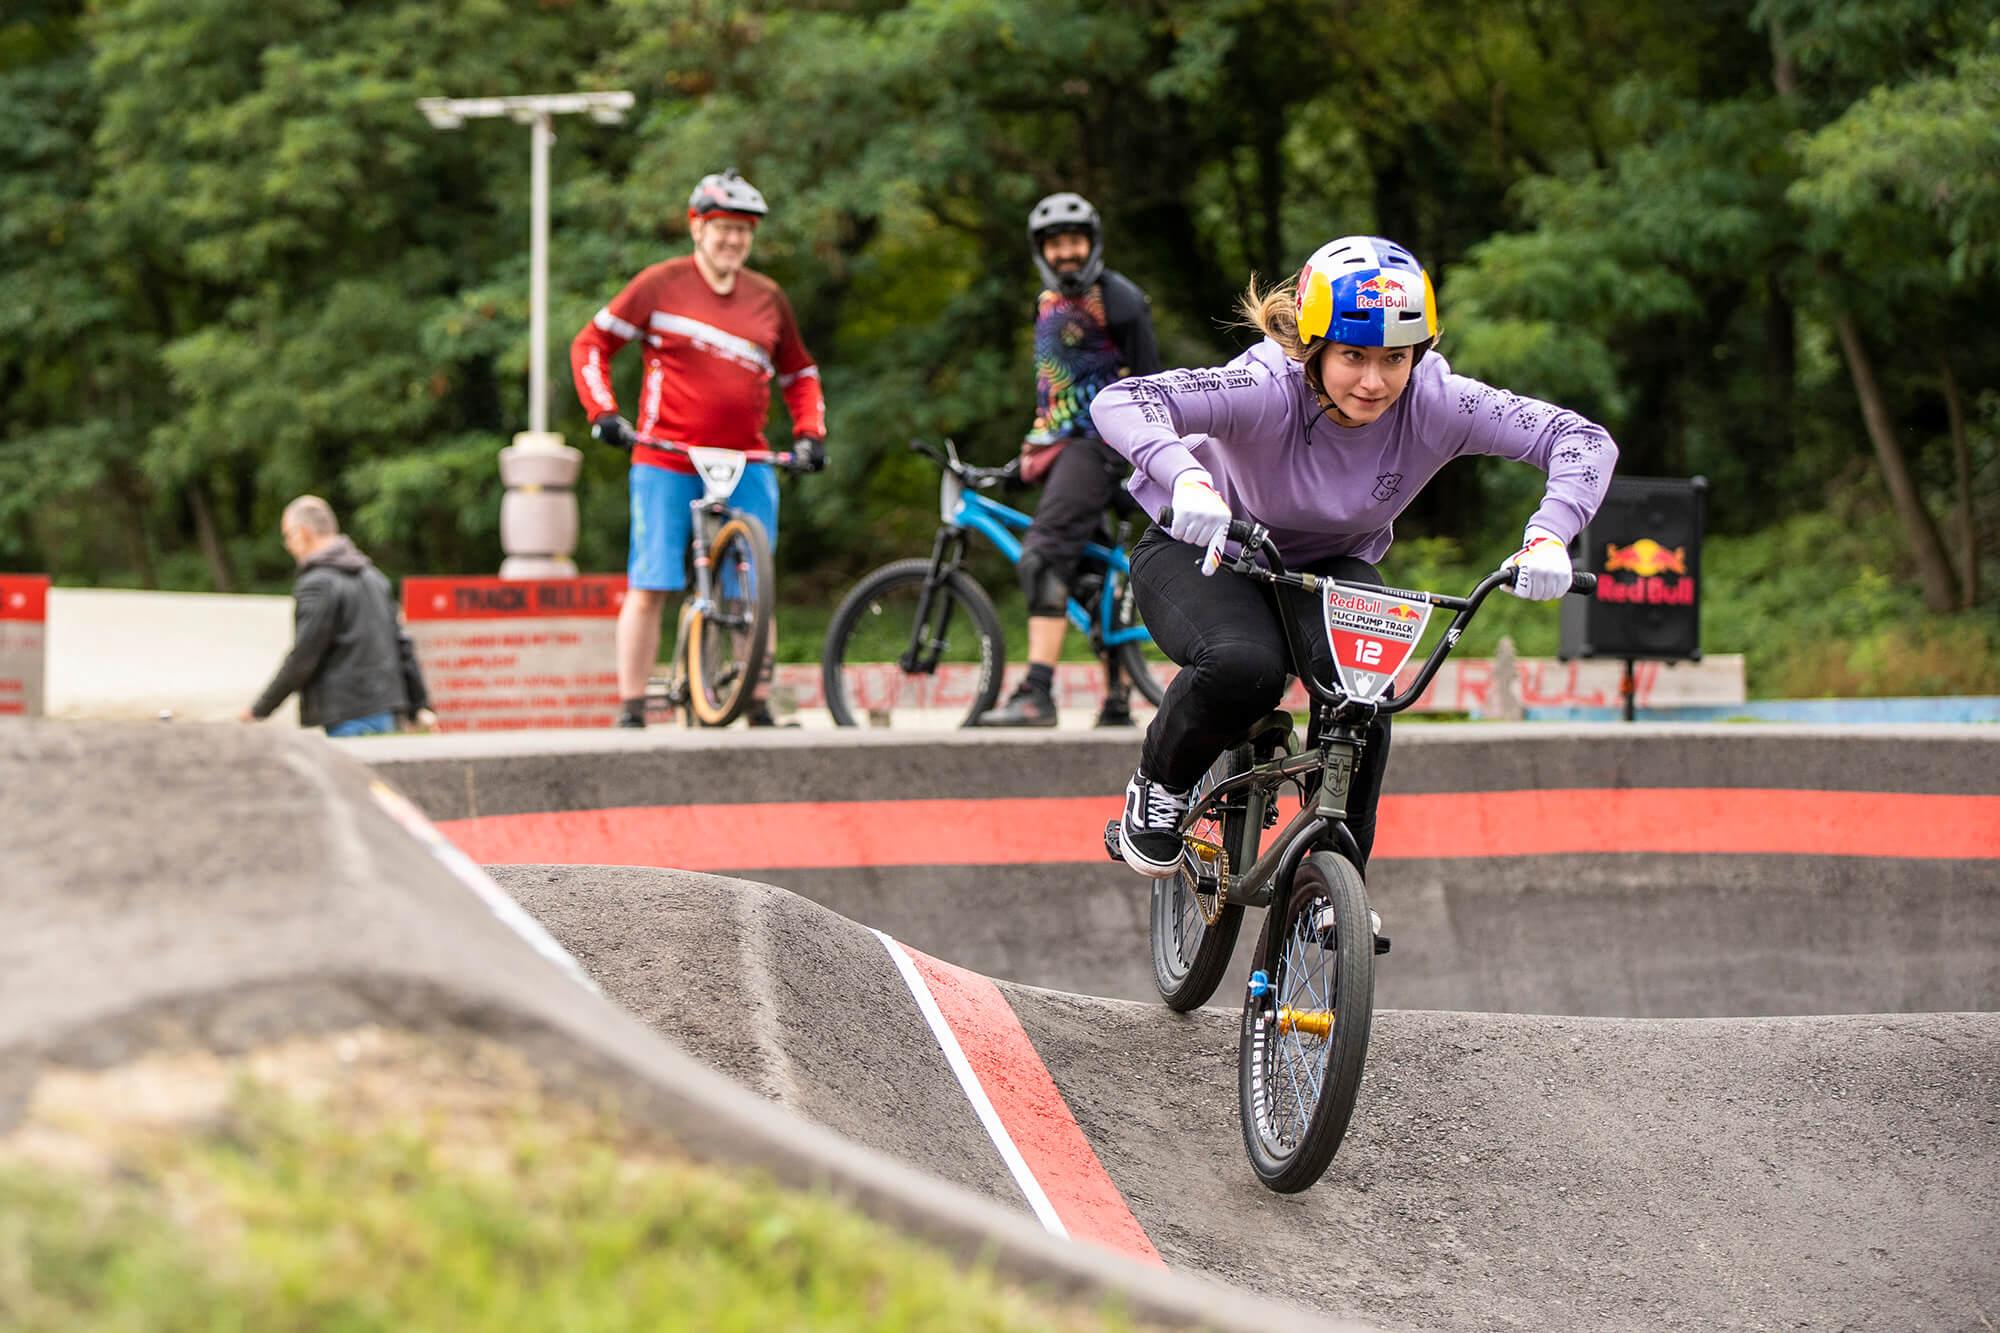 Red Bull Pump Track Qualifier Mellowpark Aug 2021 - Thomas Dietze -56